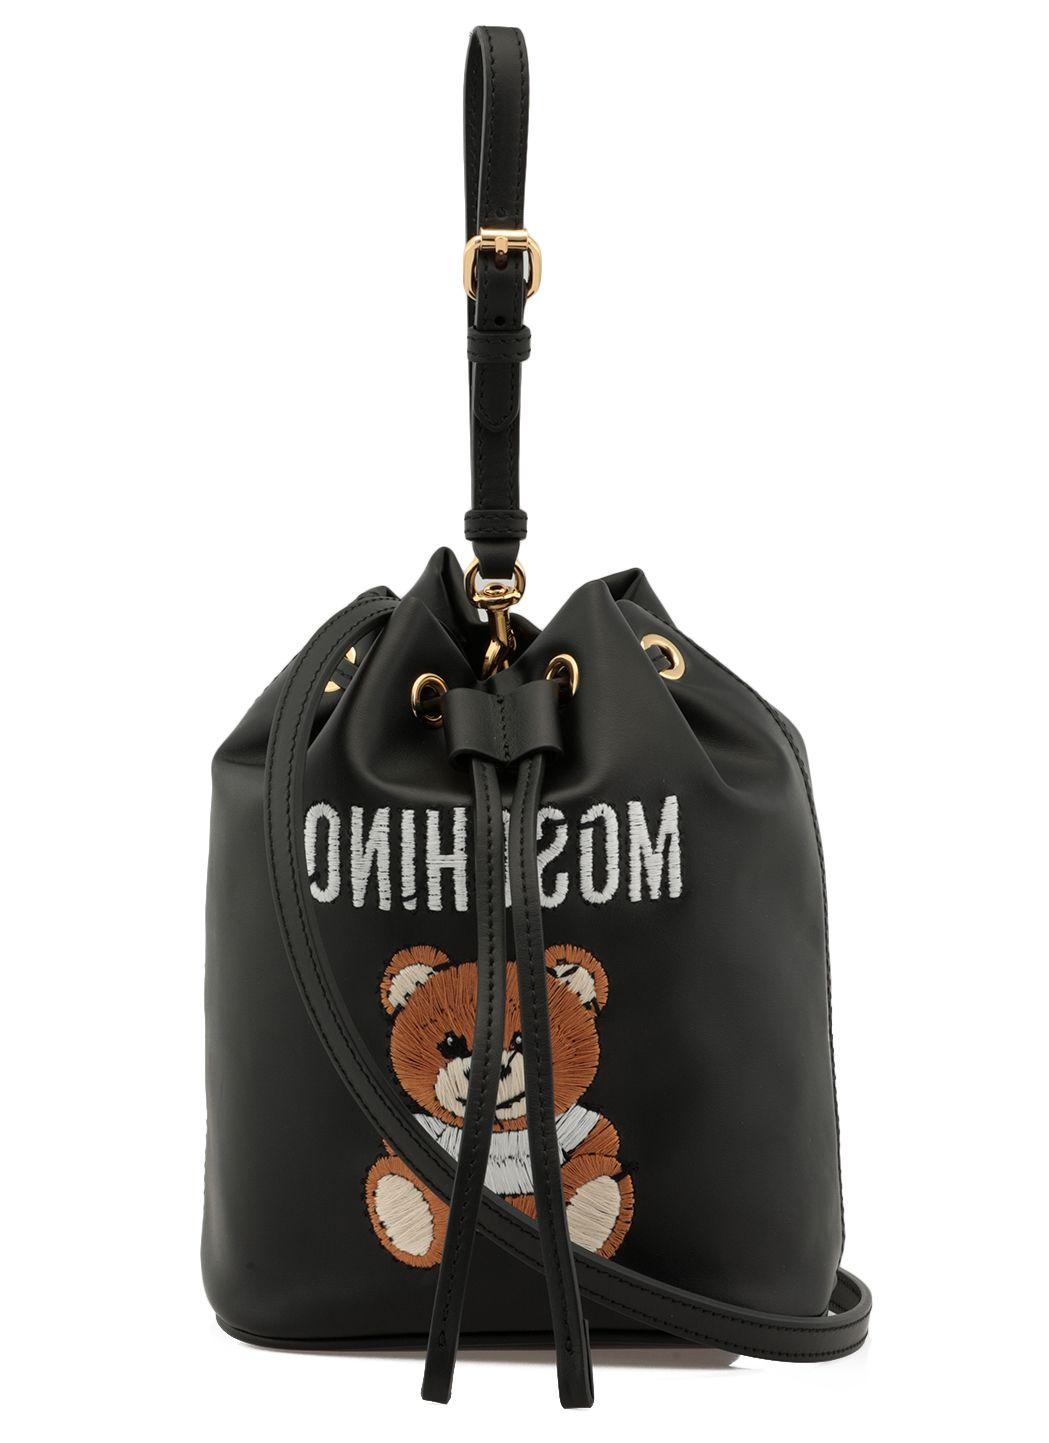 Saffiano leather bucketbag